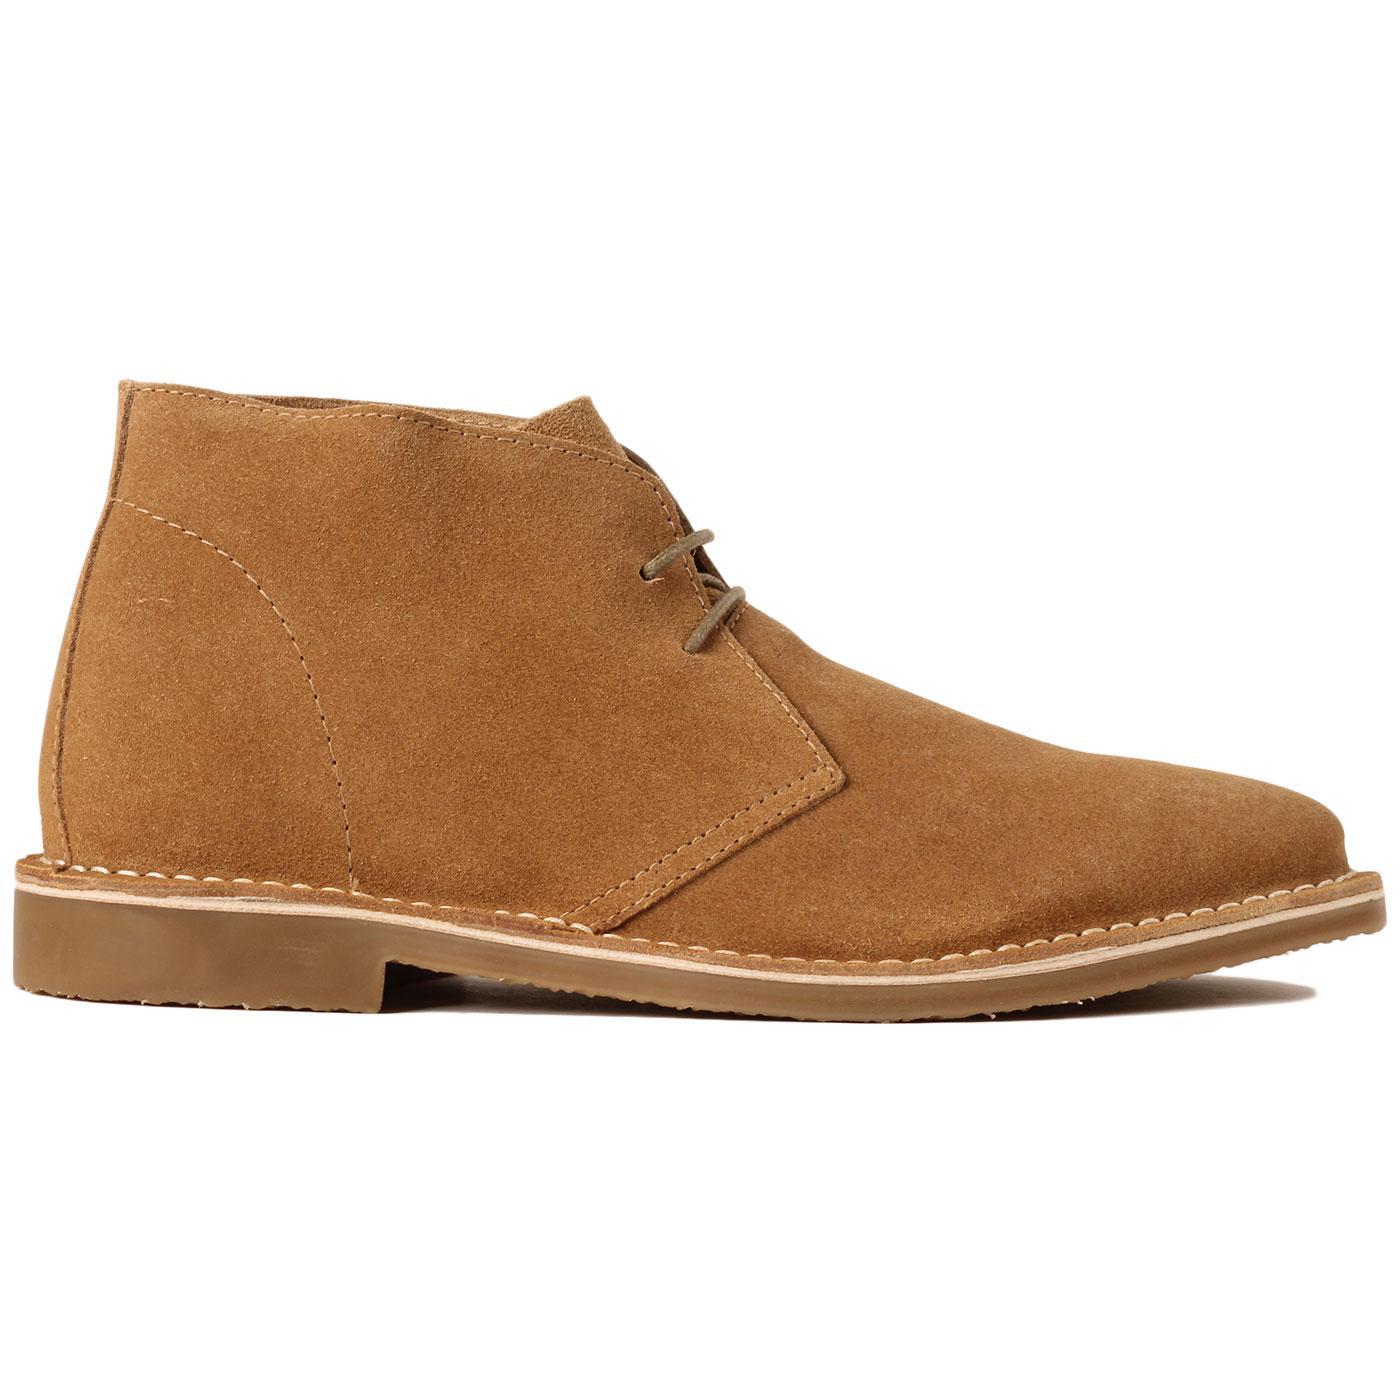 Meaden MADCAP ENGLAND Mod Suede Desert Boots (GS)